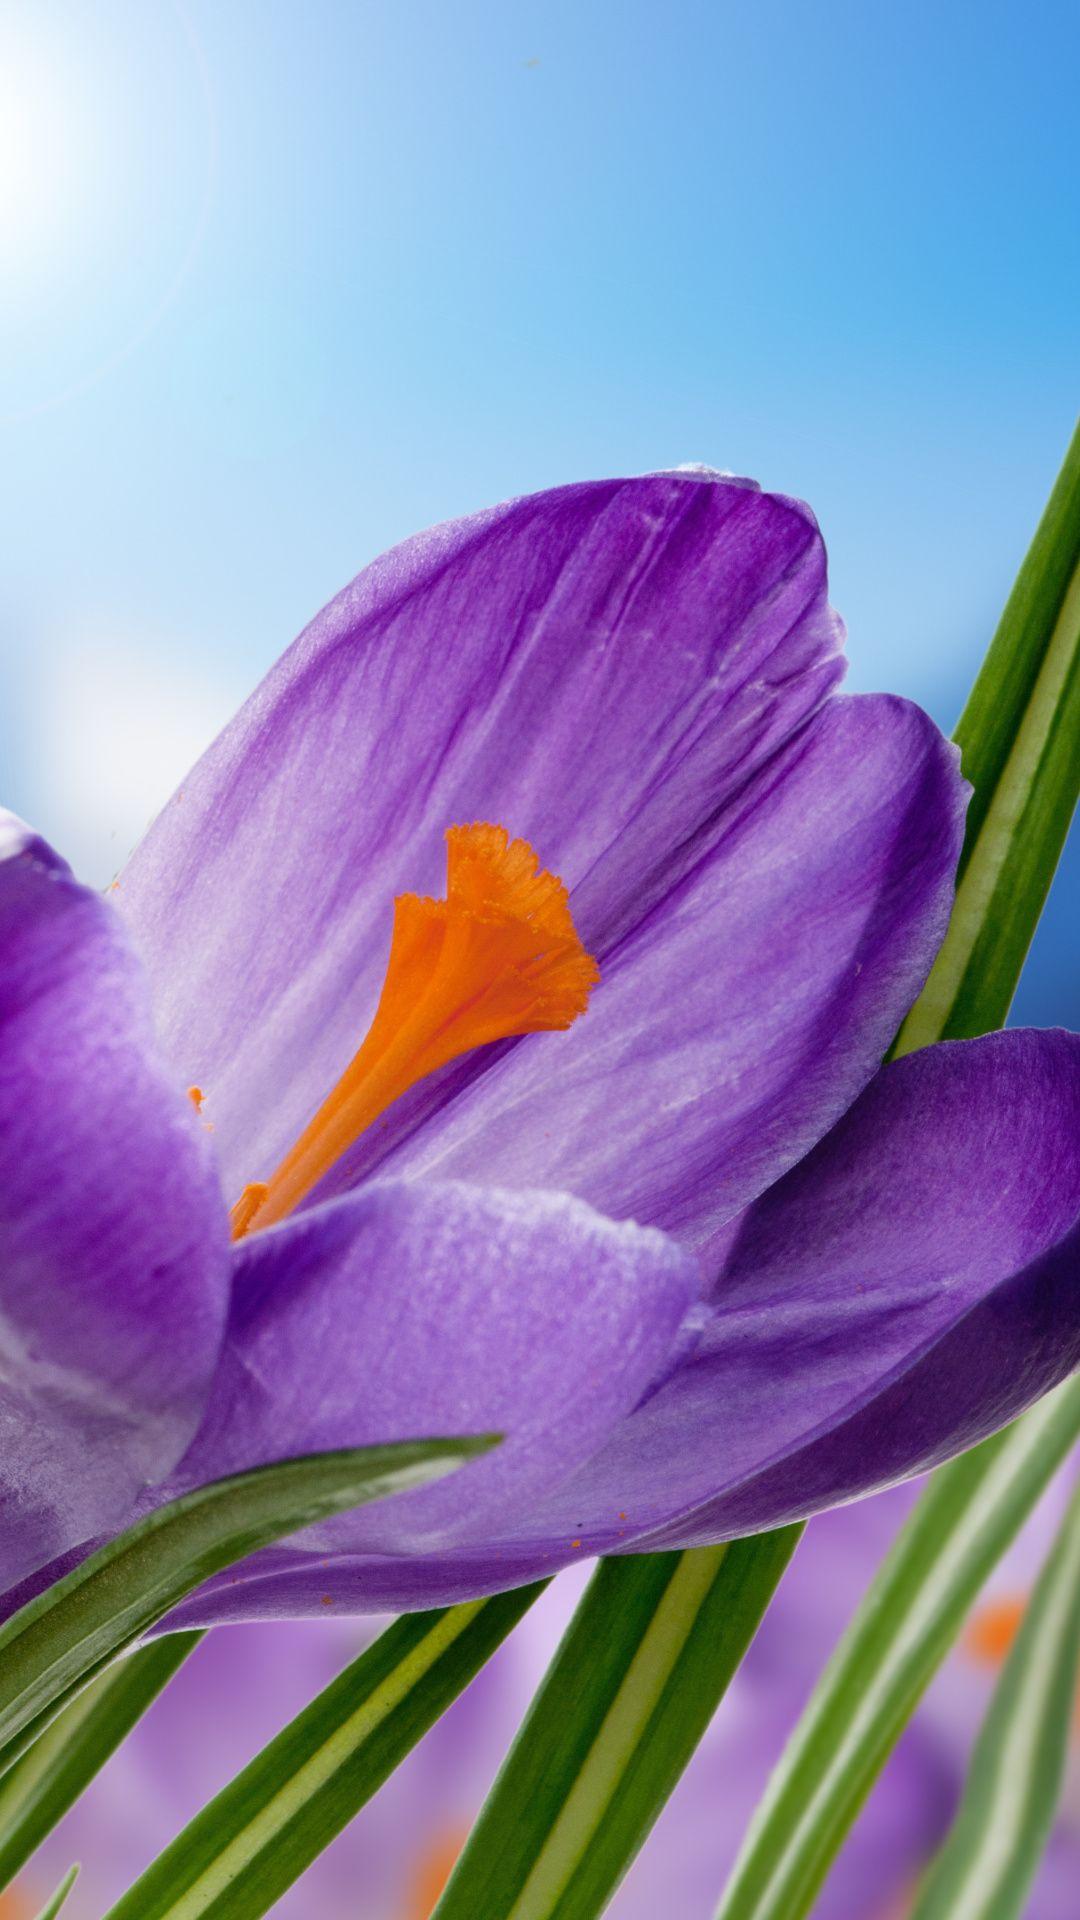 The Crocus Flower